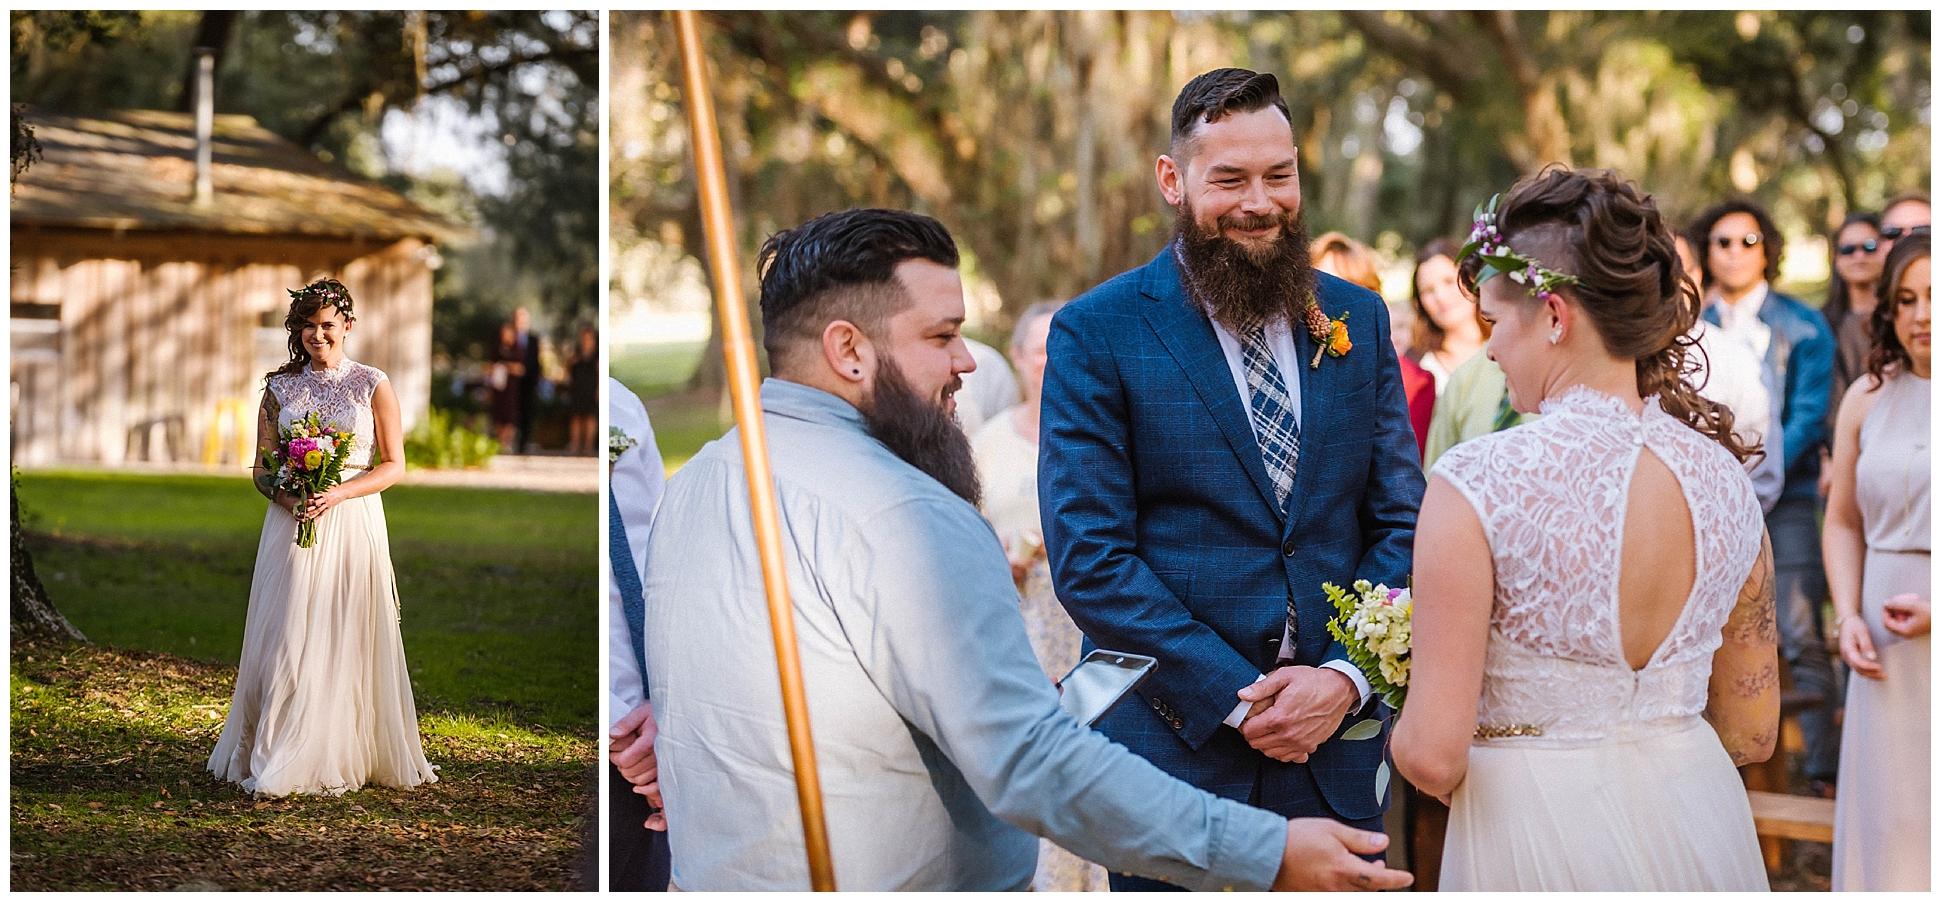 magical-outdoor-florida-wedding-smoke-bombs-flowers-crown-beard_0028.jpg